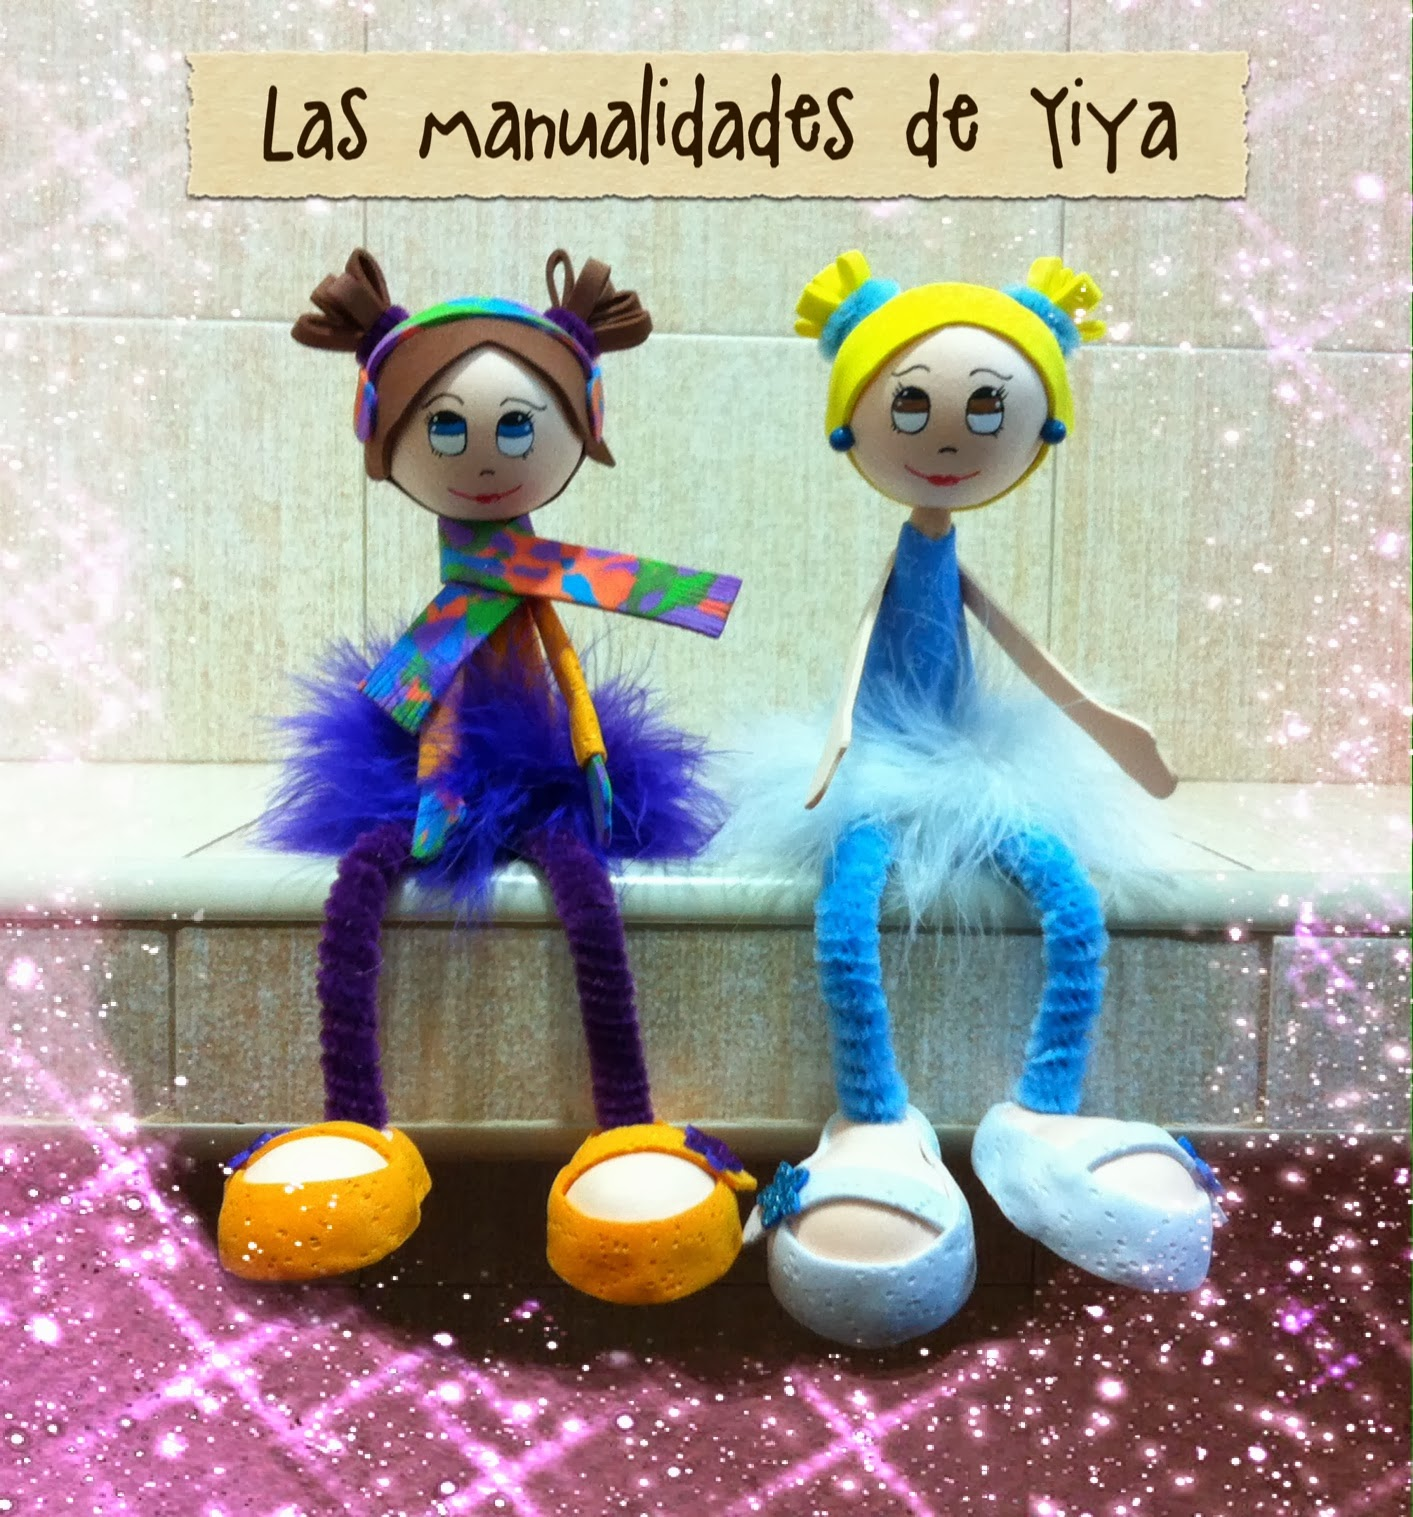 Las Manualidades de Yiya: Cuadros con fofuchas (25x30 cm).